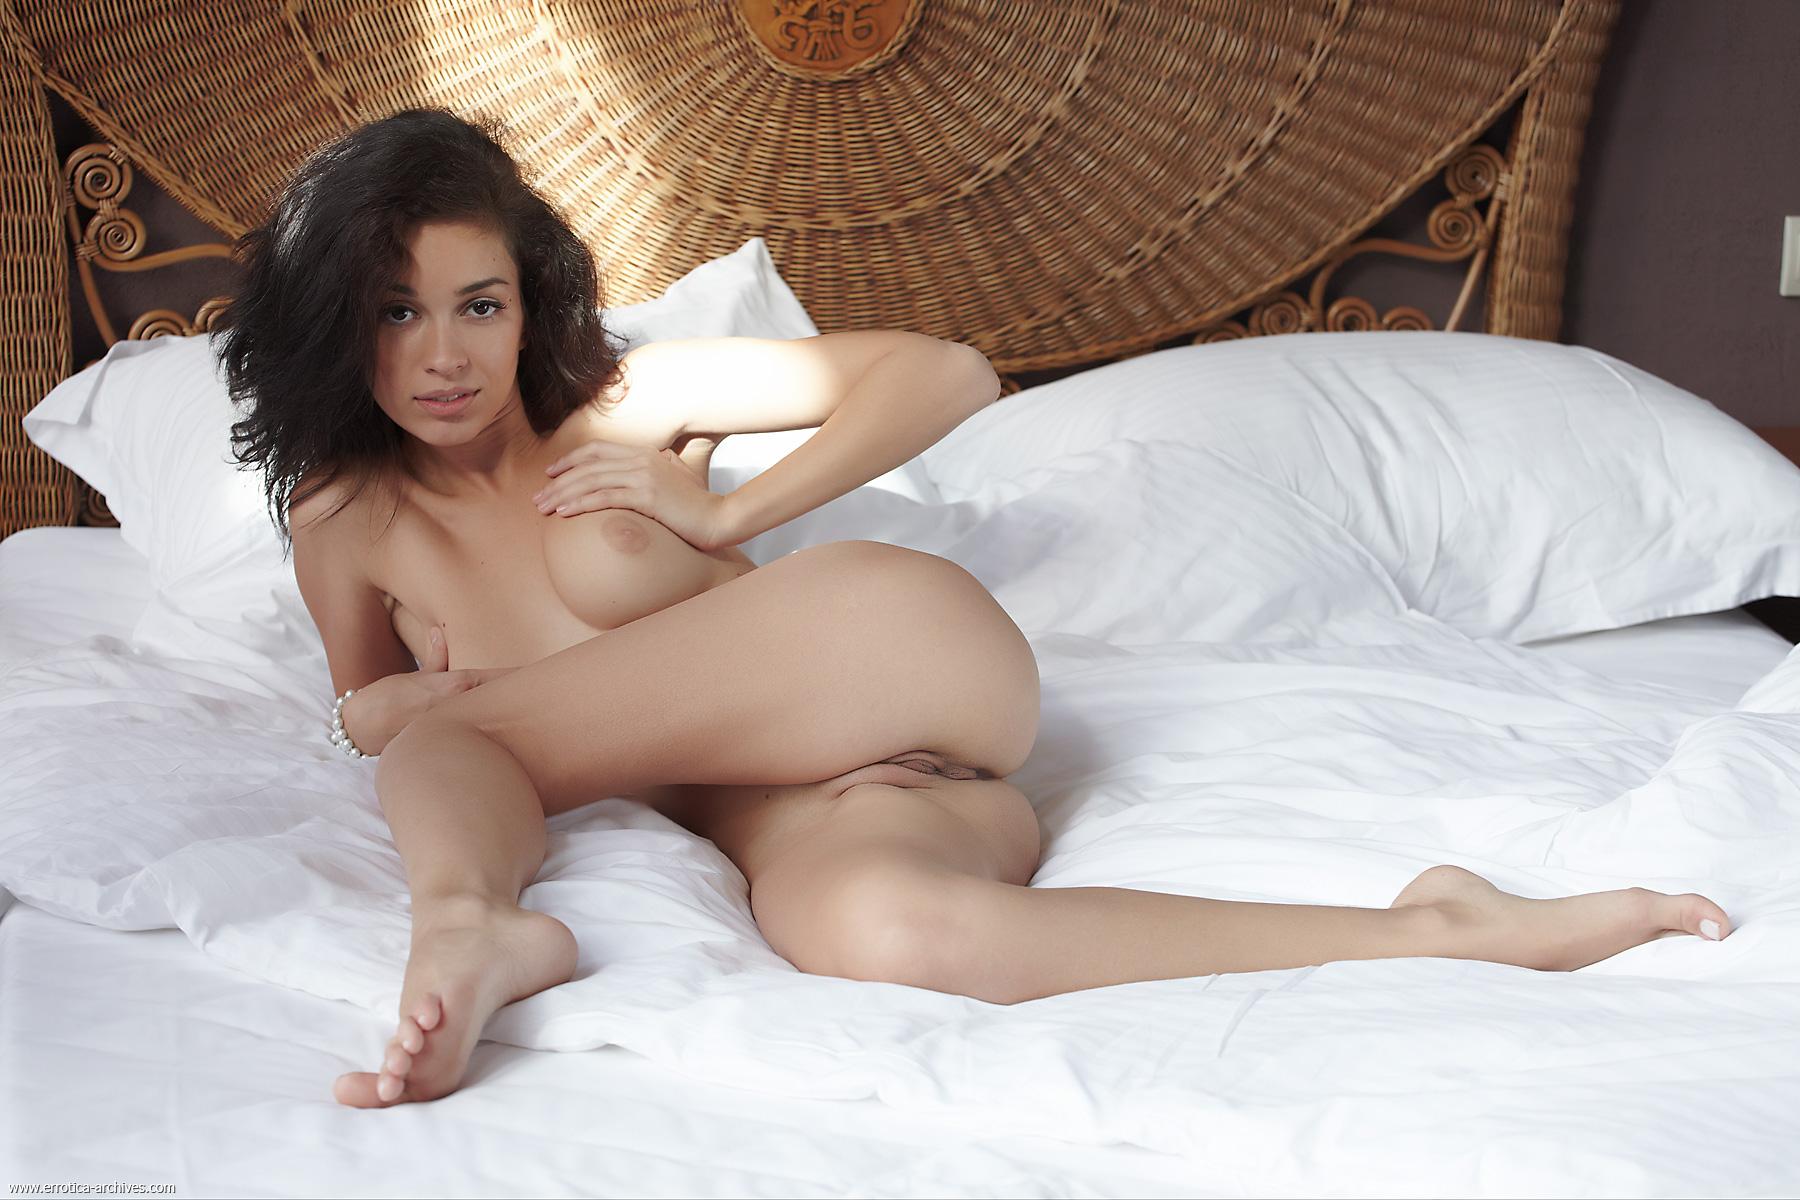 porn on a pool table